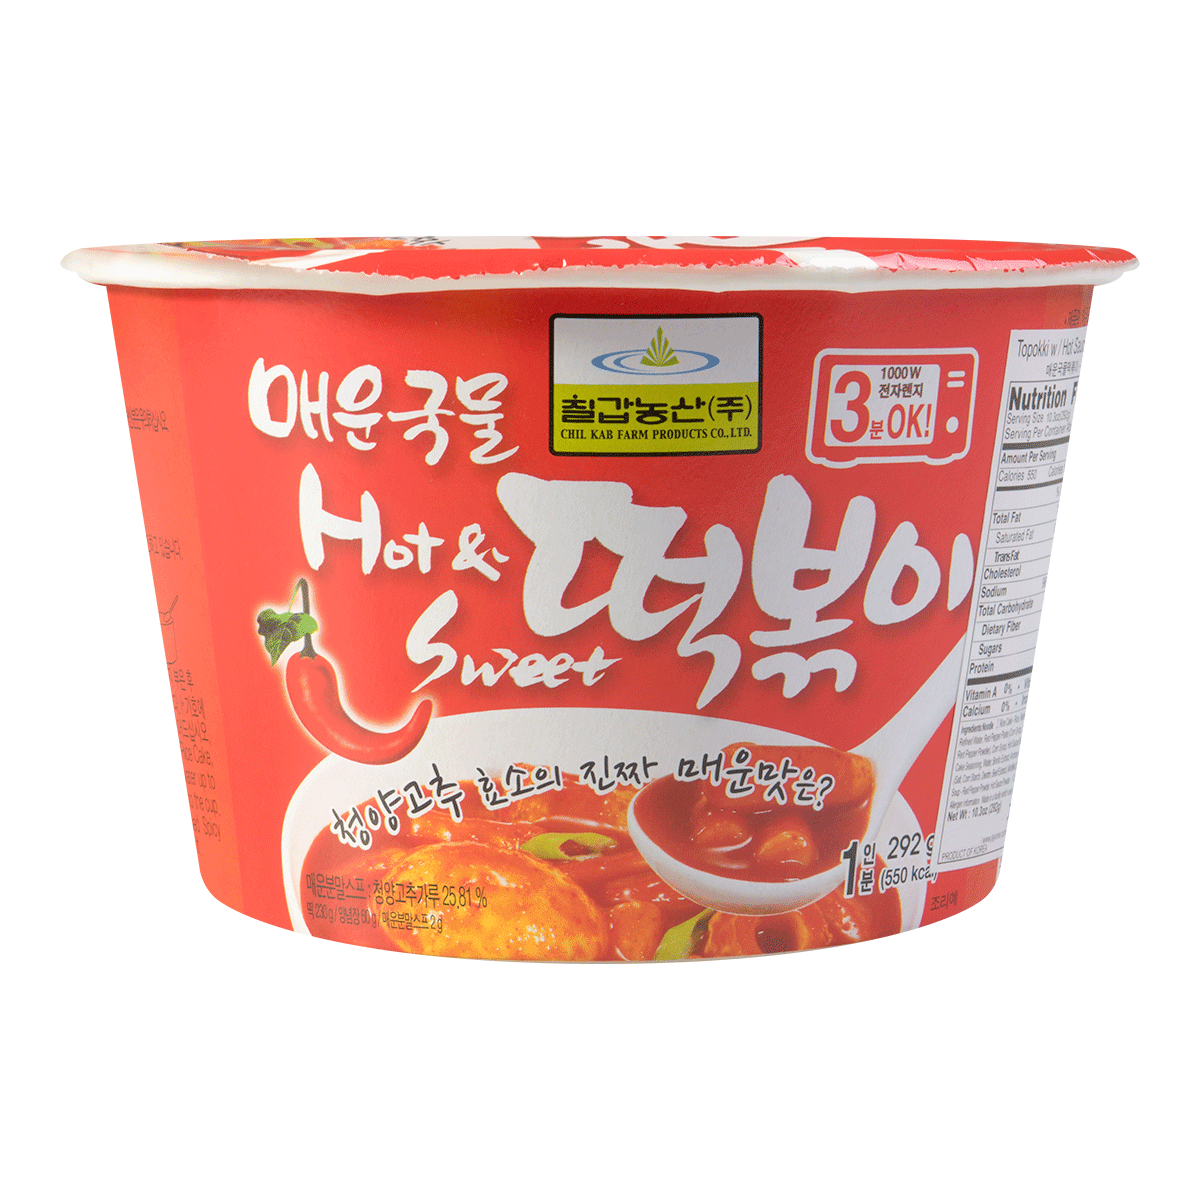 韩国CHILKAB 辣炒年糕汤 碗装 292g